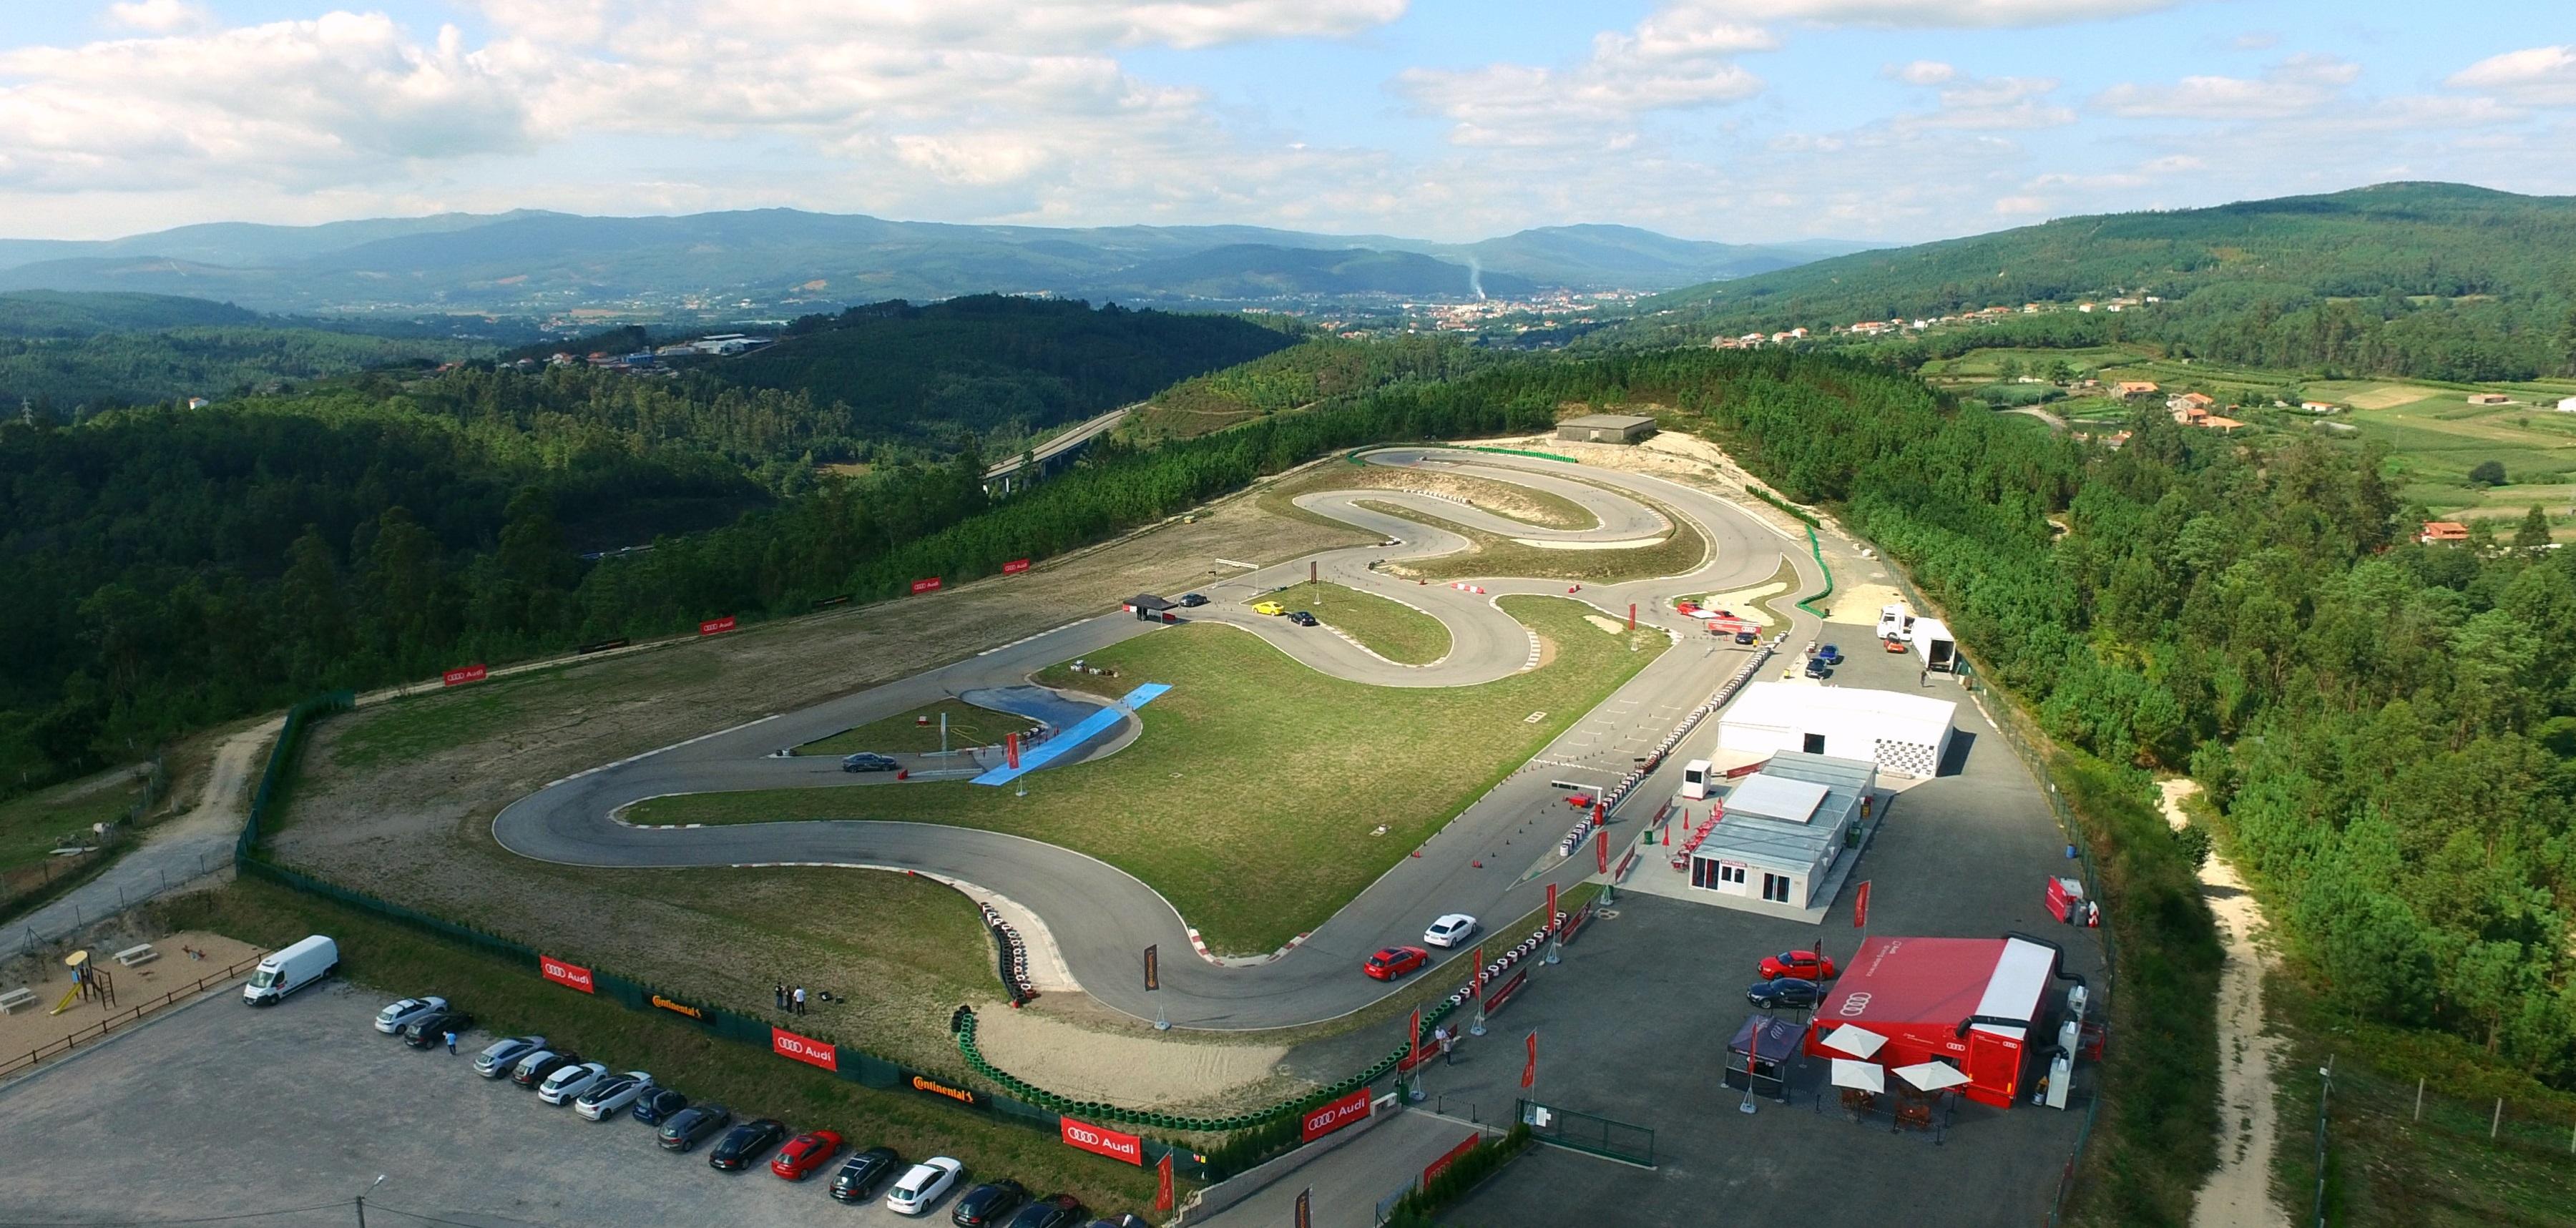 Circuito de karts en Valga . Karting en Pontevedra